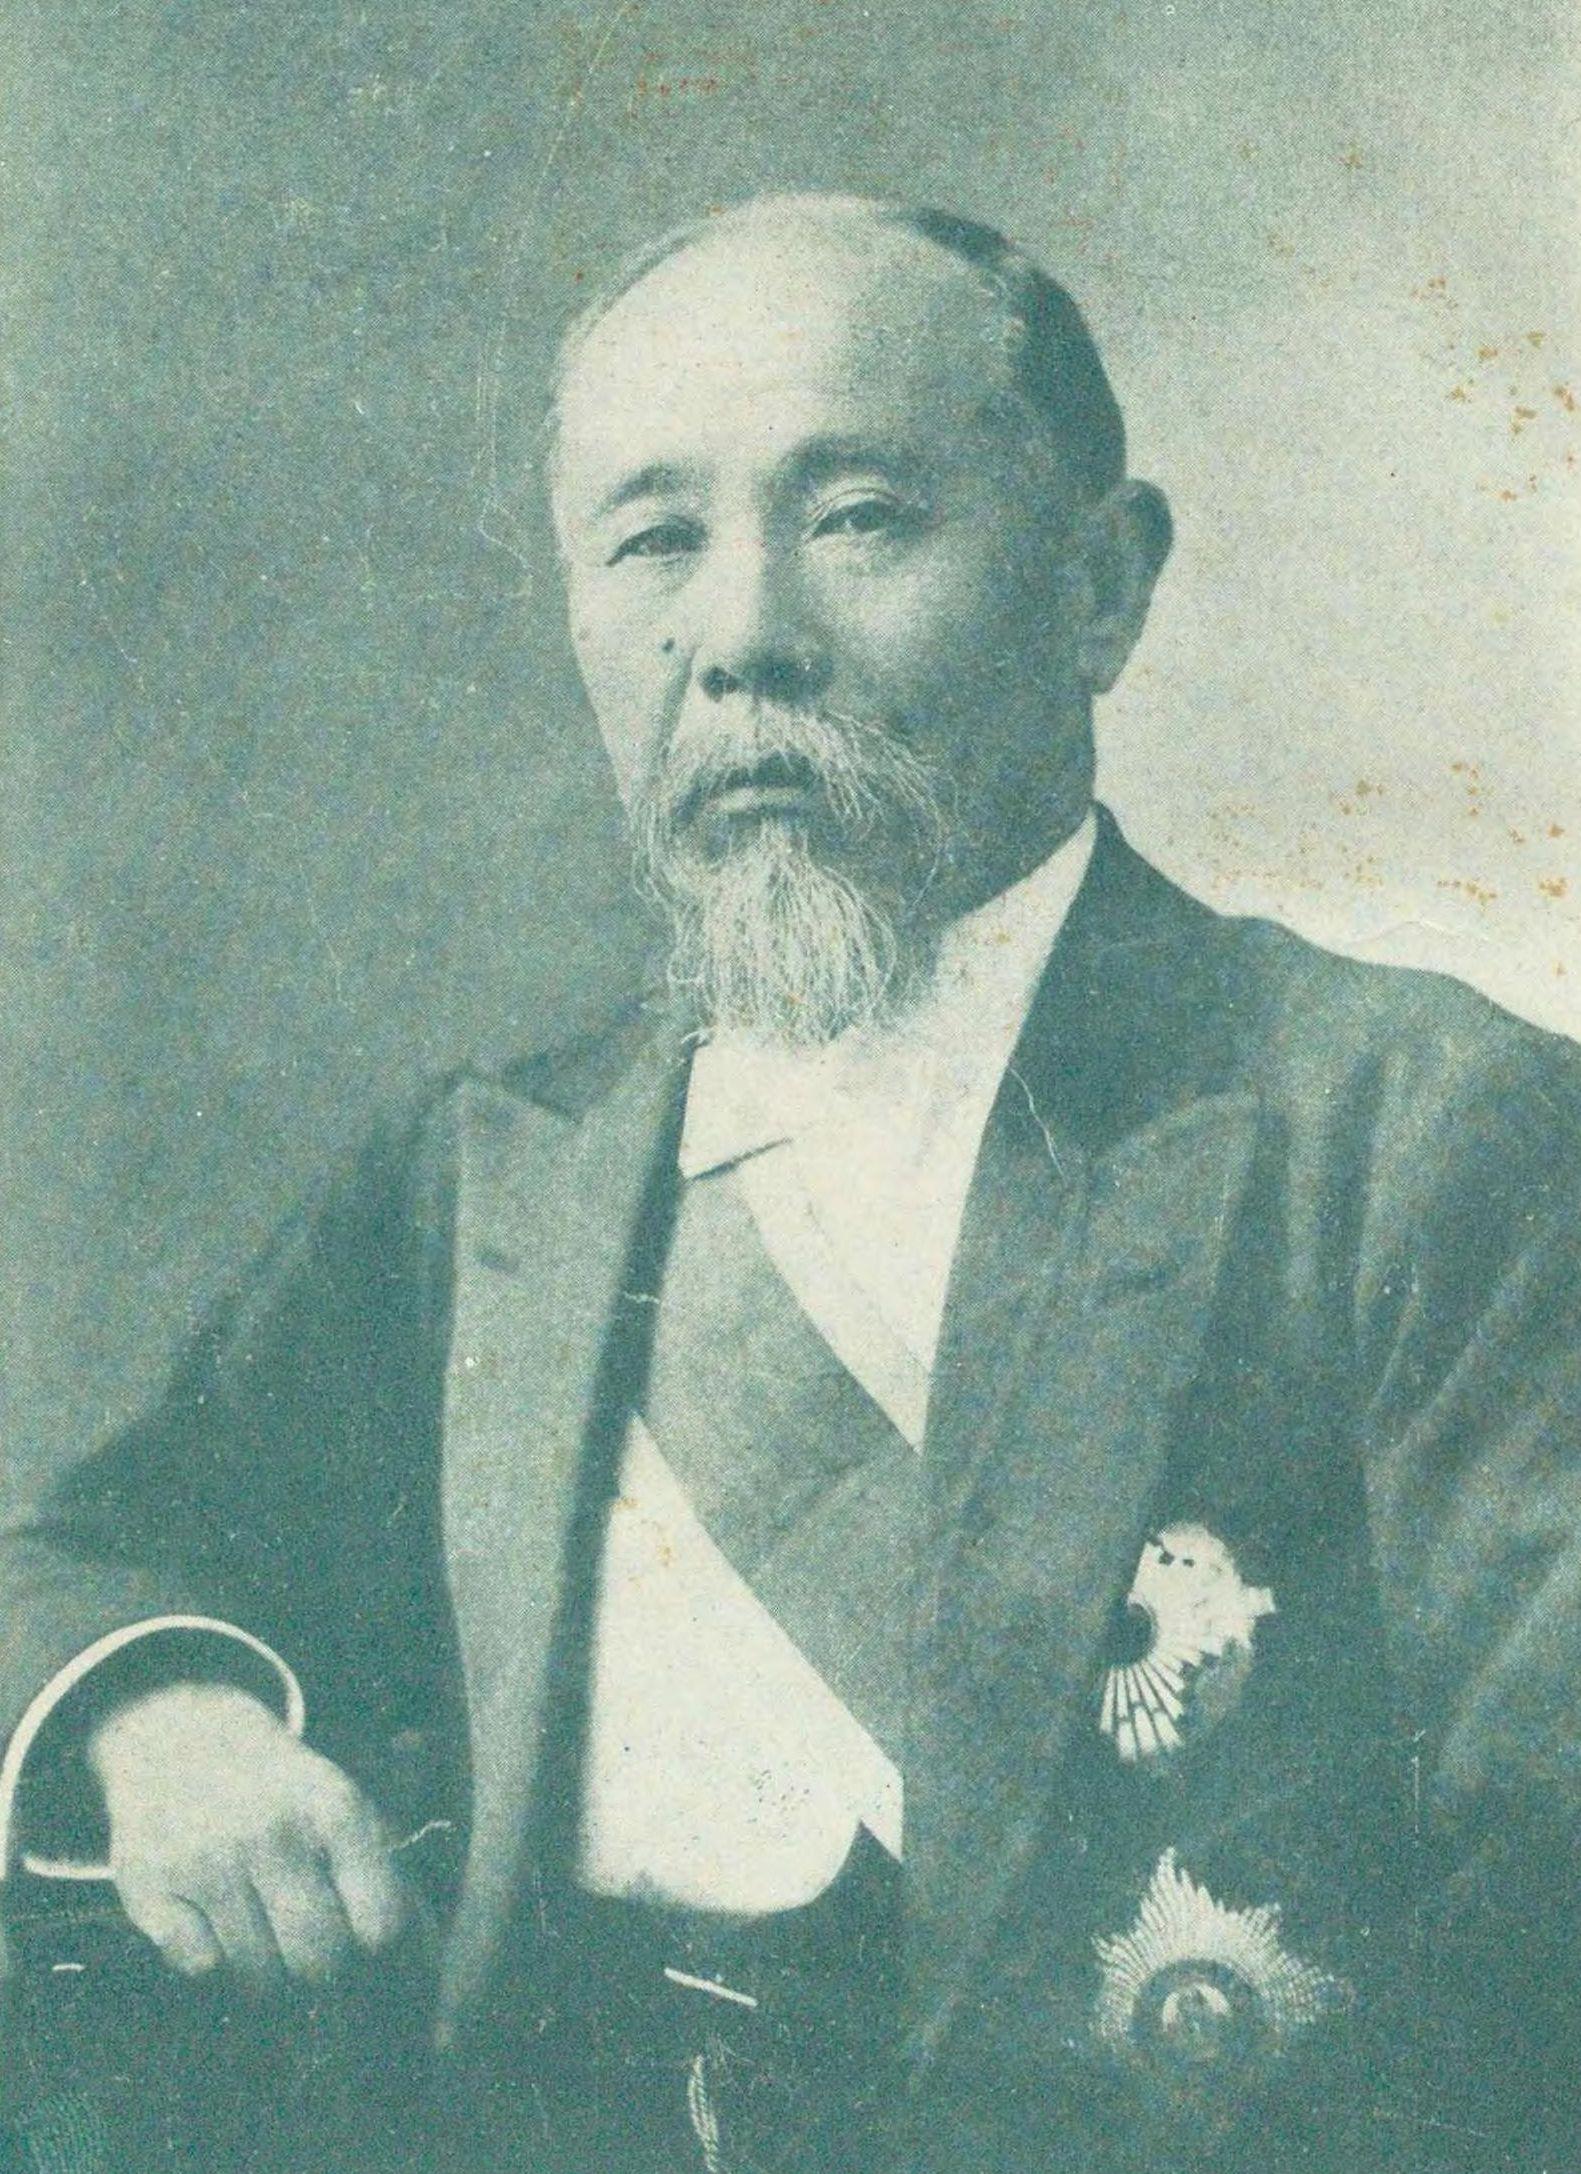 Ito Hirobumi as President of Rikken Seiyu Kai in 1903.jpg